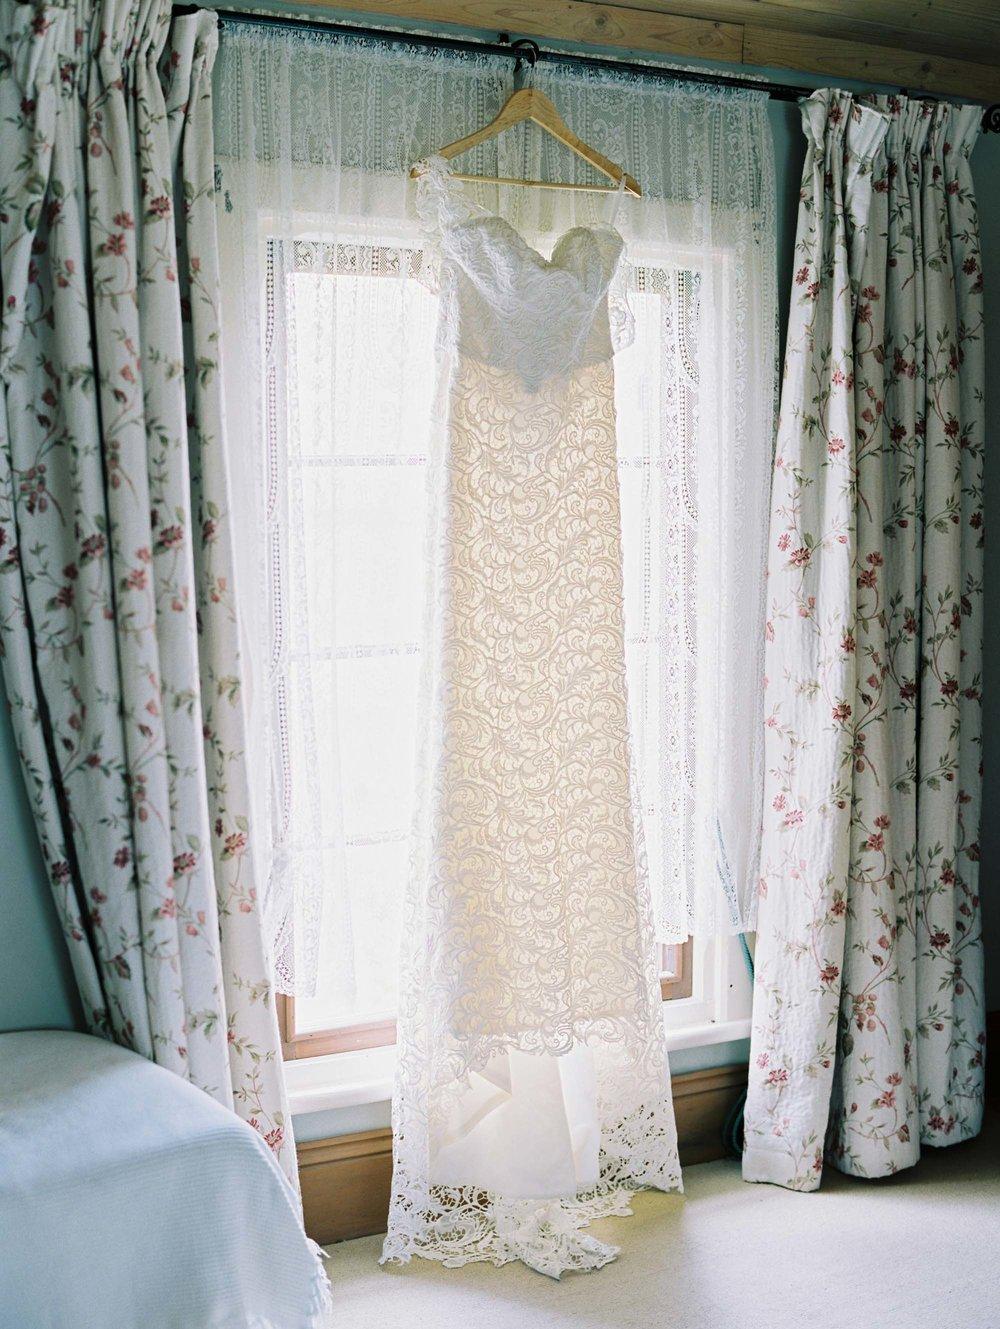 Golding-Wines-wedding-photography-014.jpg